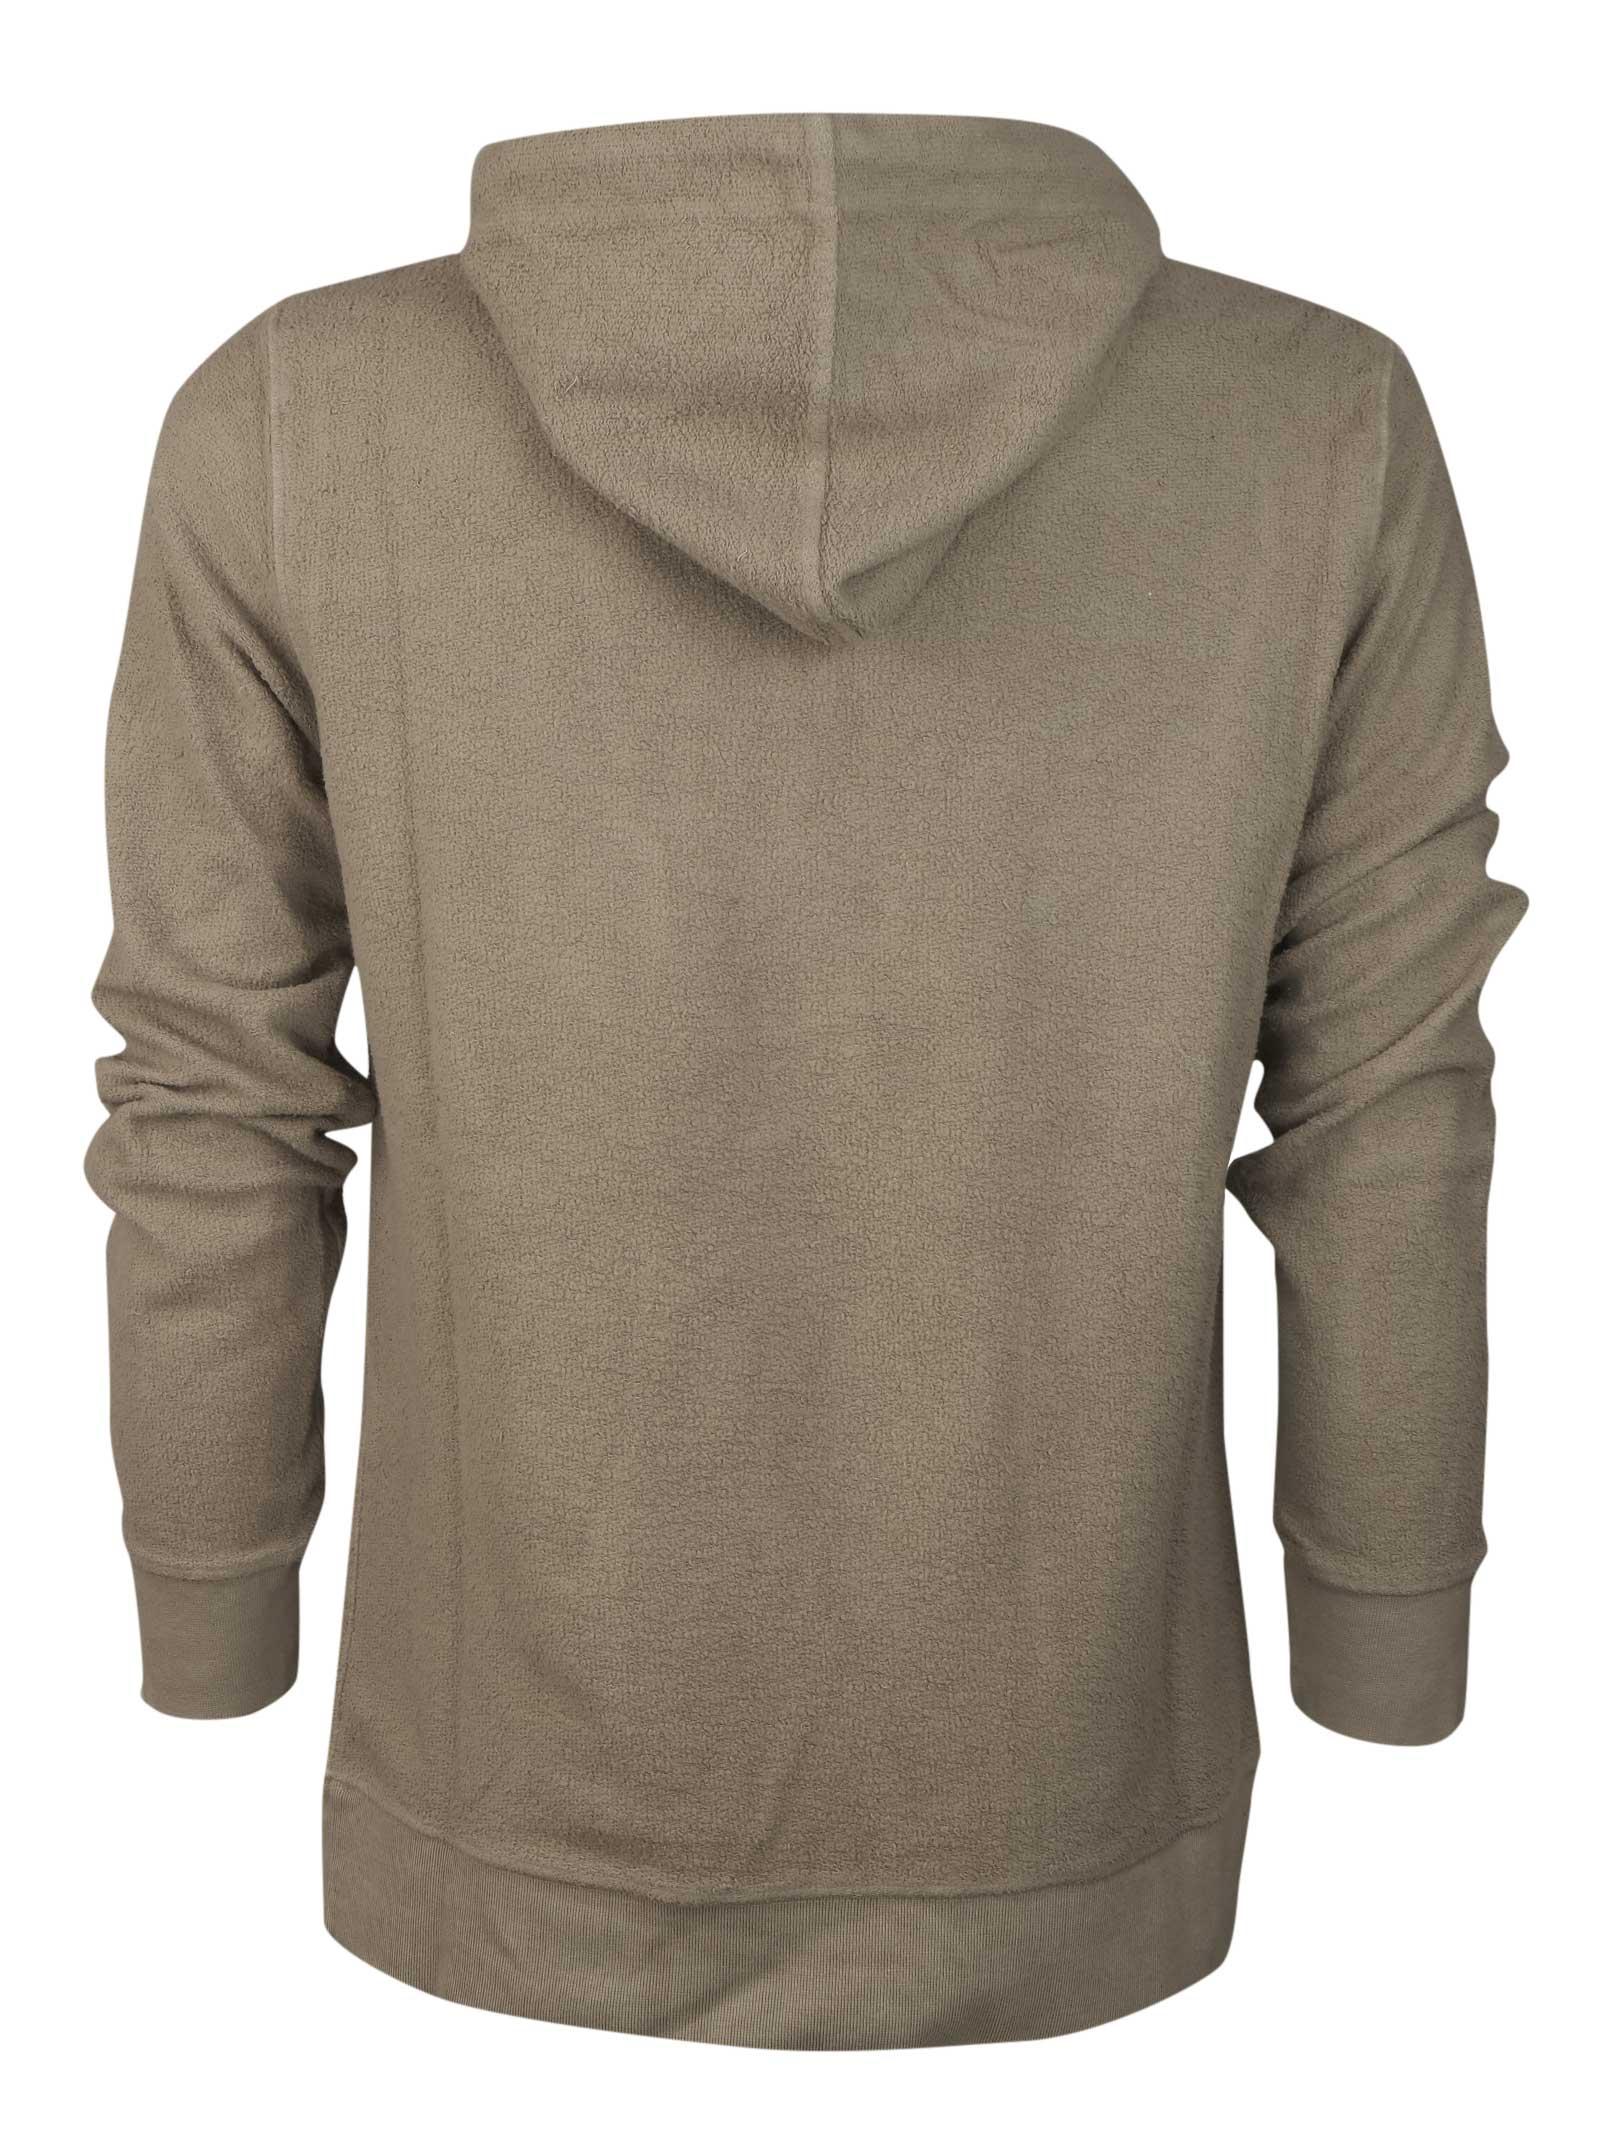 hooded sweat shirt WOOL & CO.   Sweats   822631